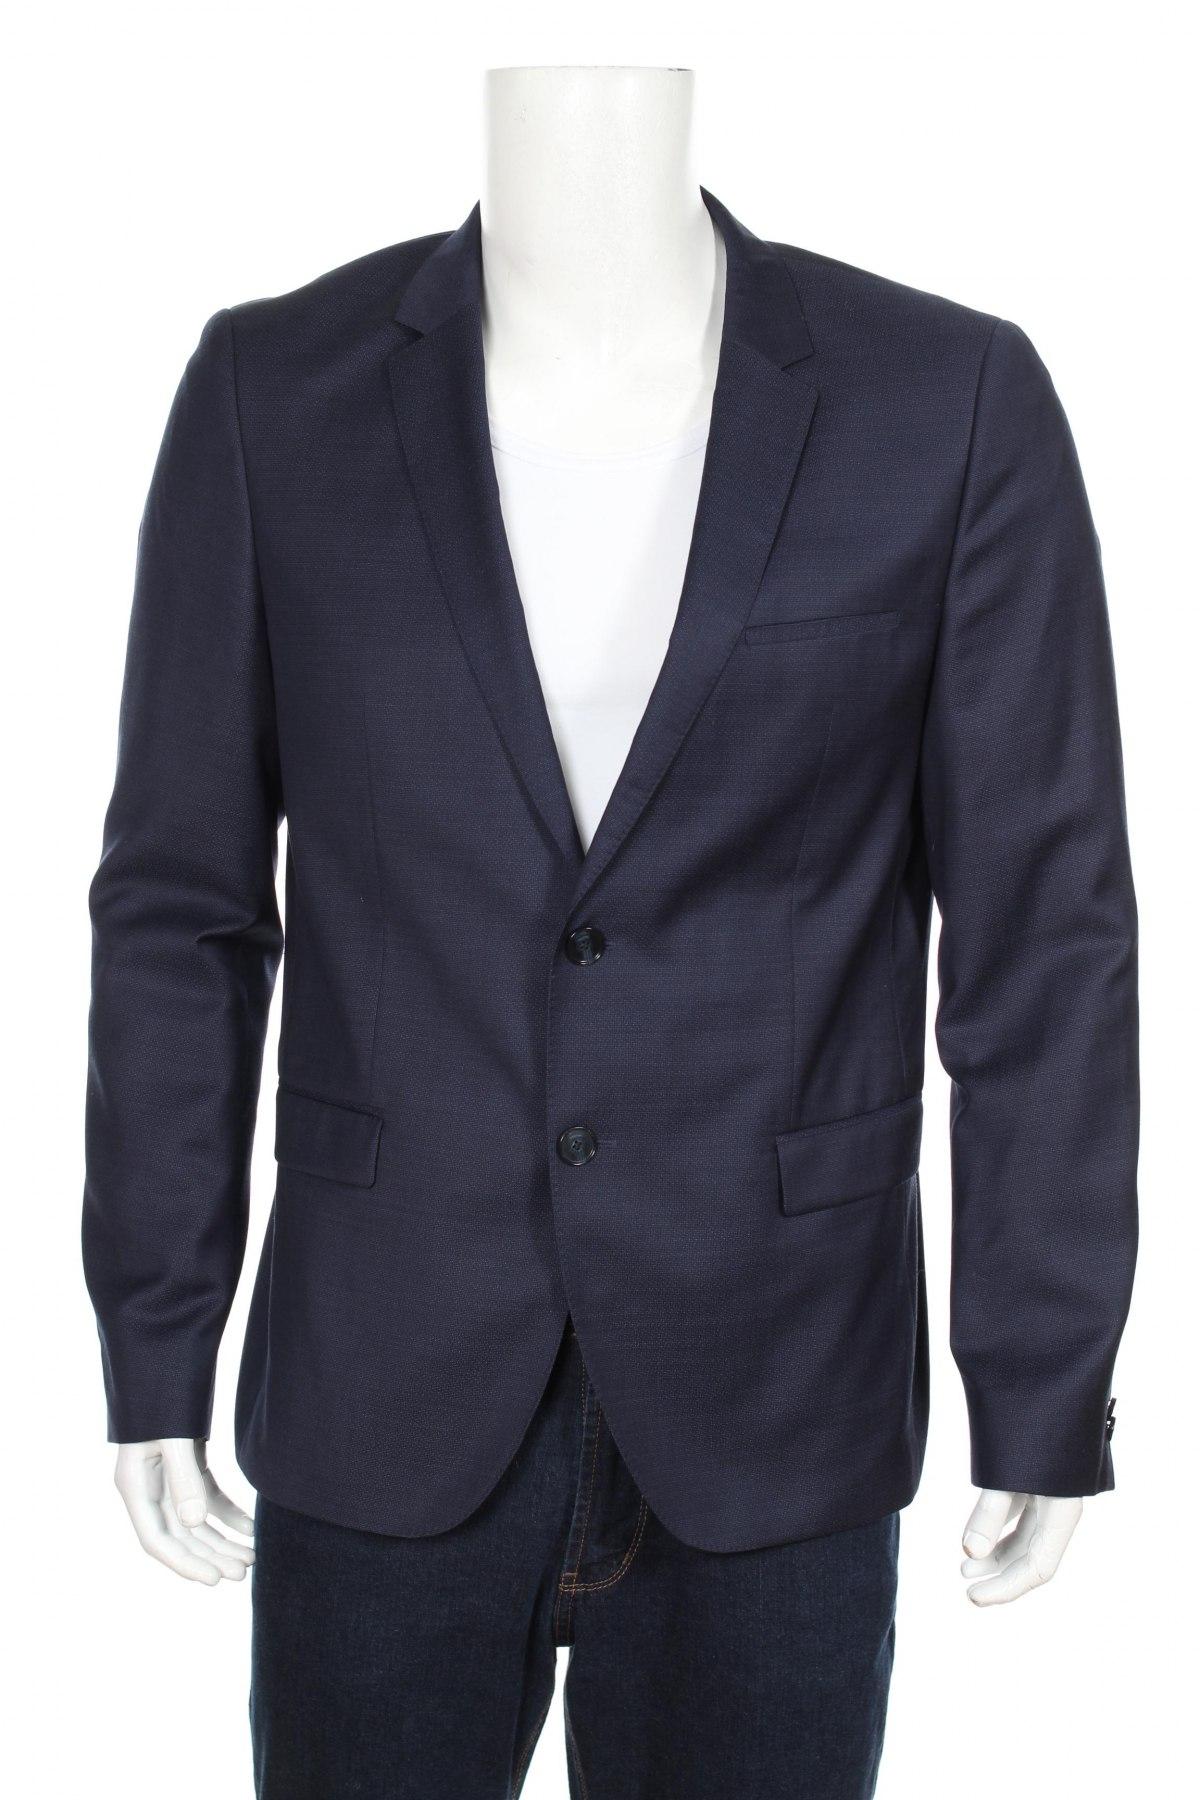 1c914eb027f Ανδρικό σακάκι Hugo Boss